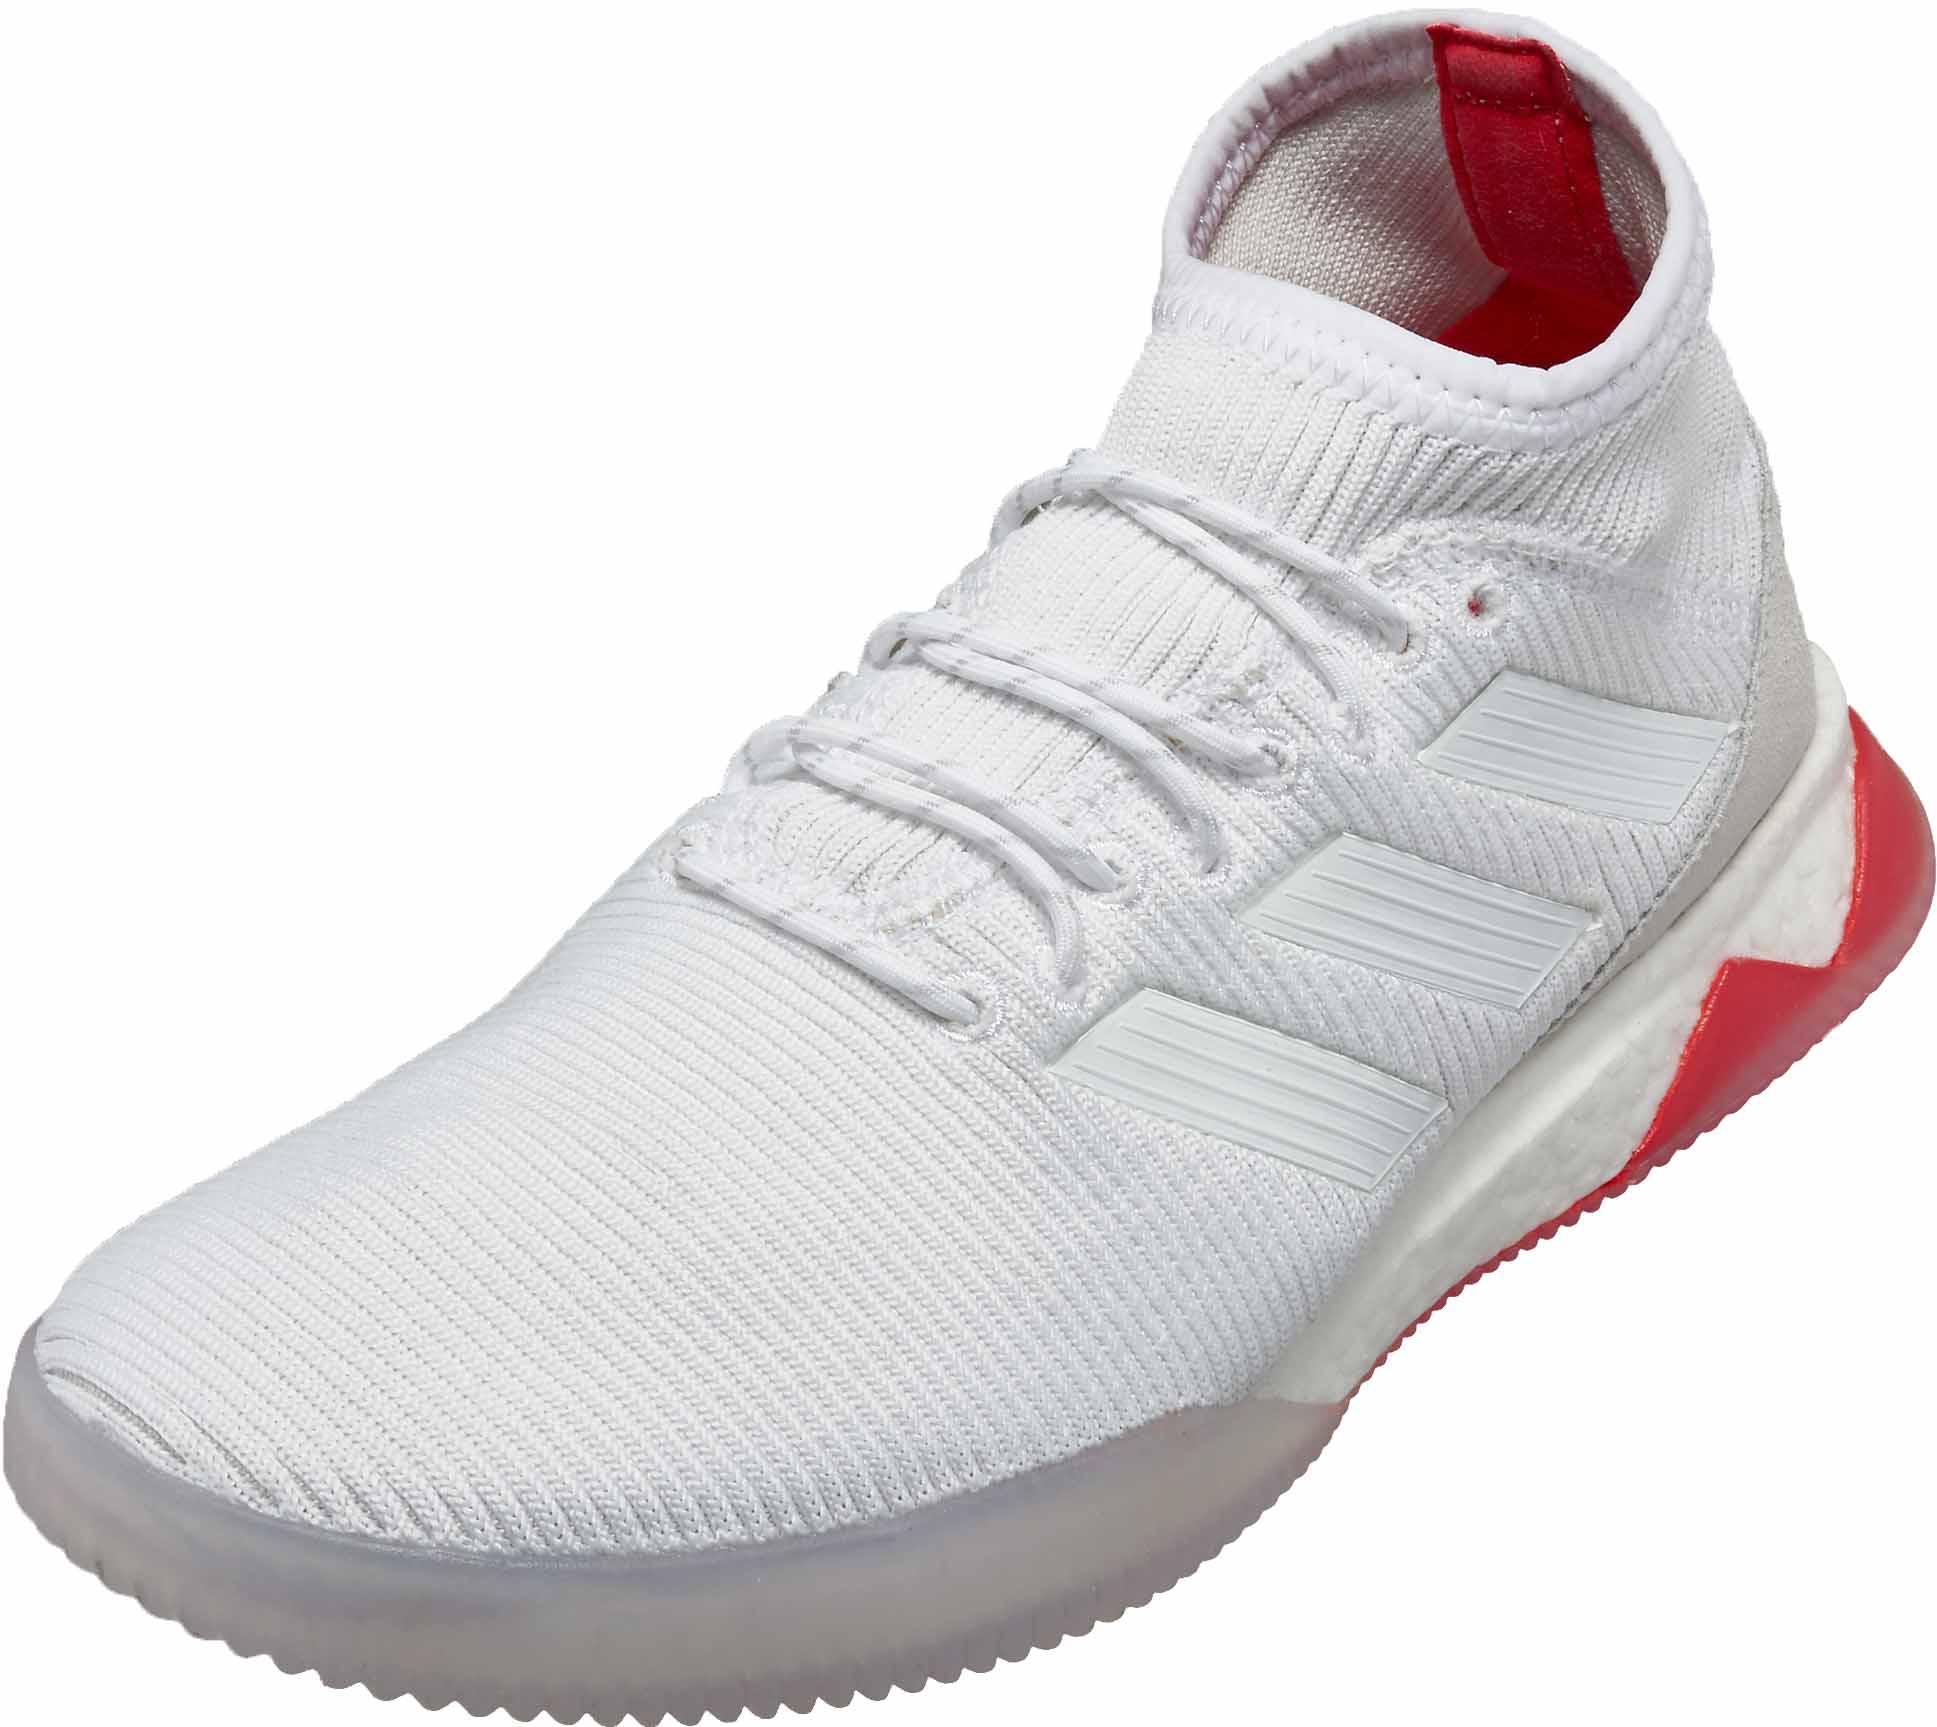 b9adcf1f336 adidas Predator Tango 18.1 TR – White Real Coral